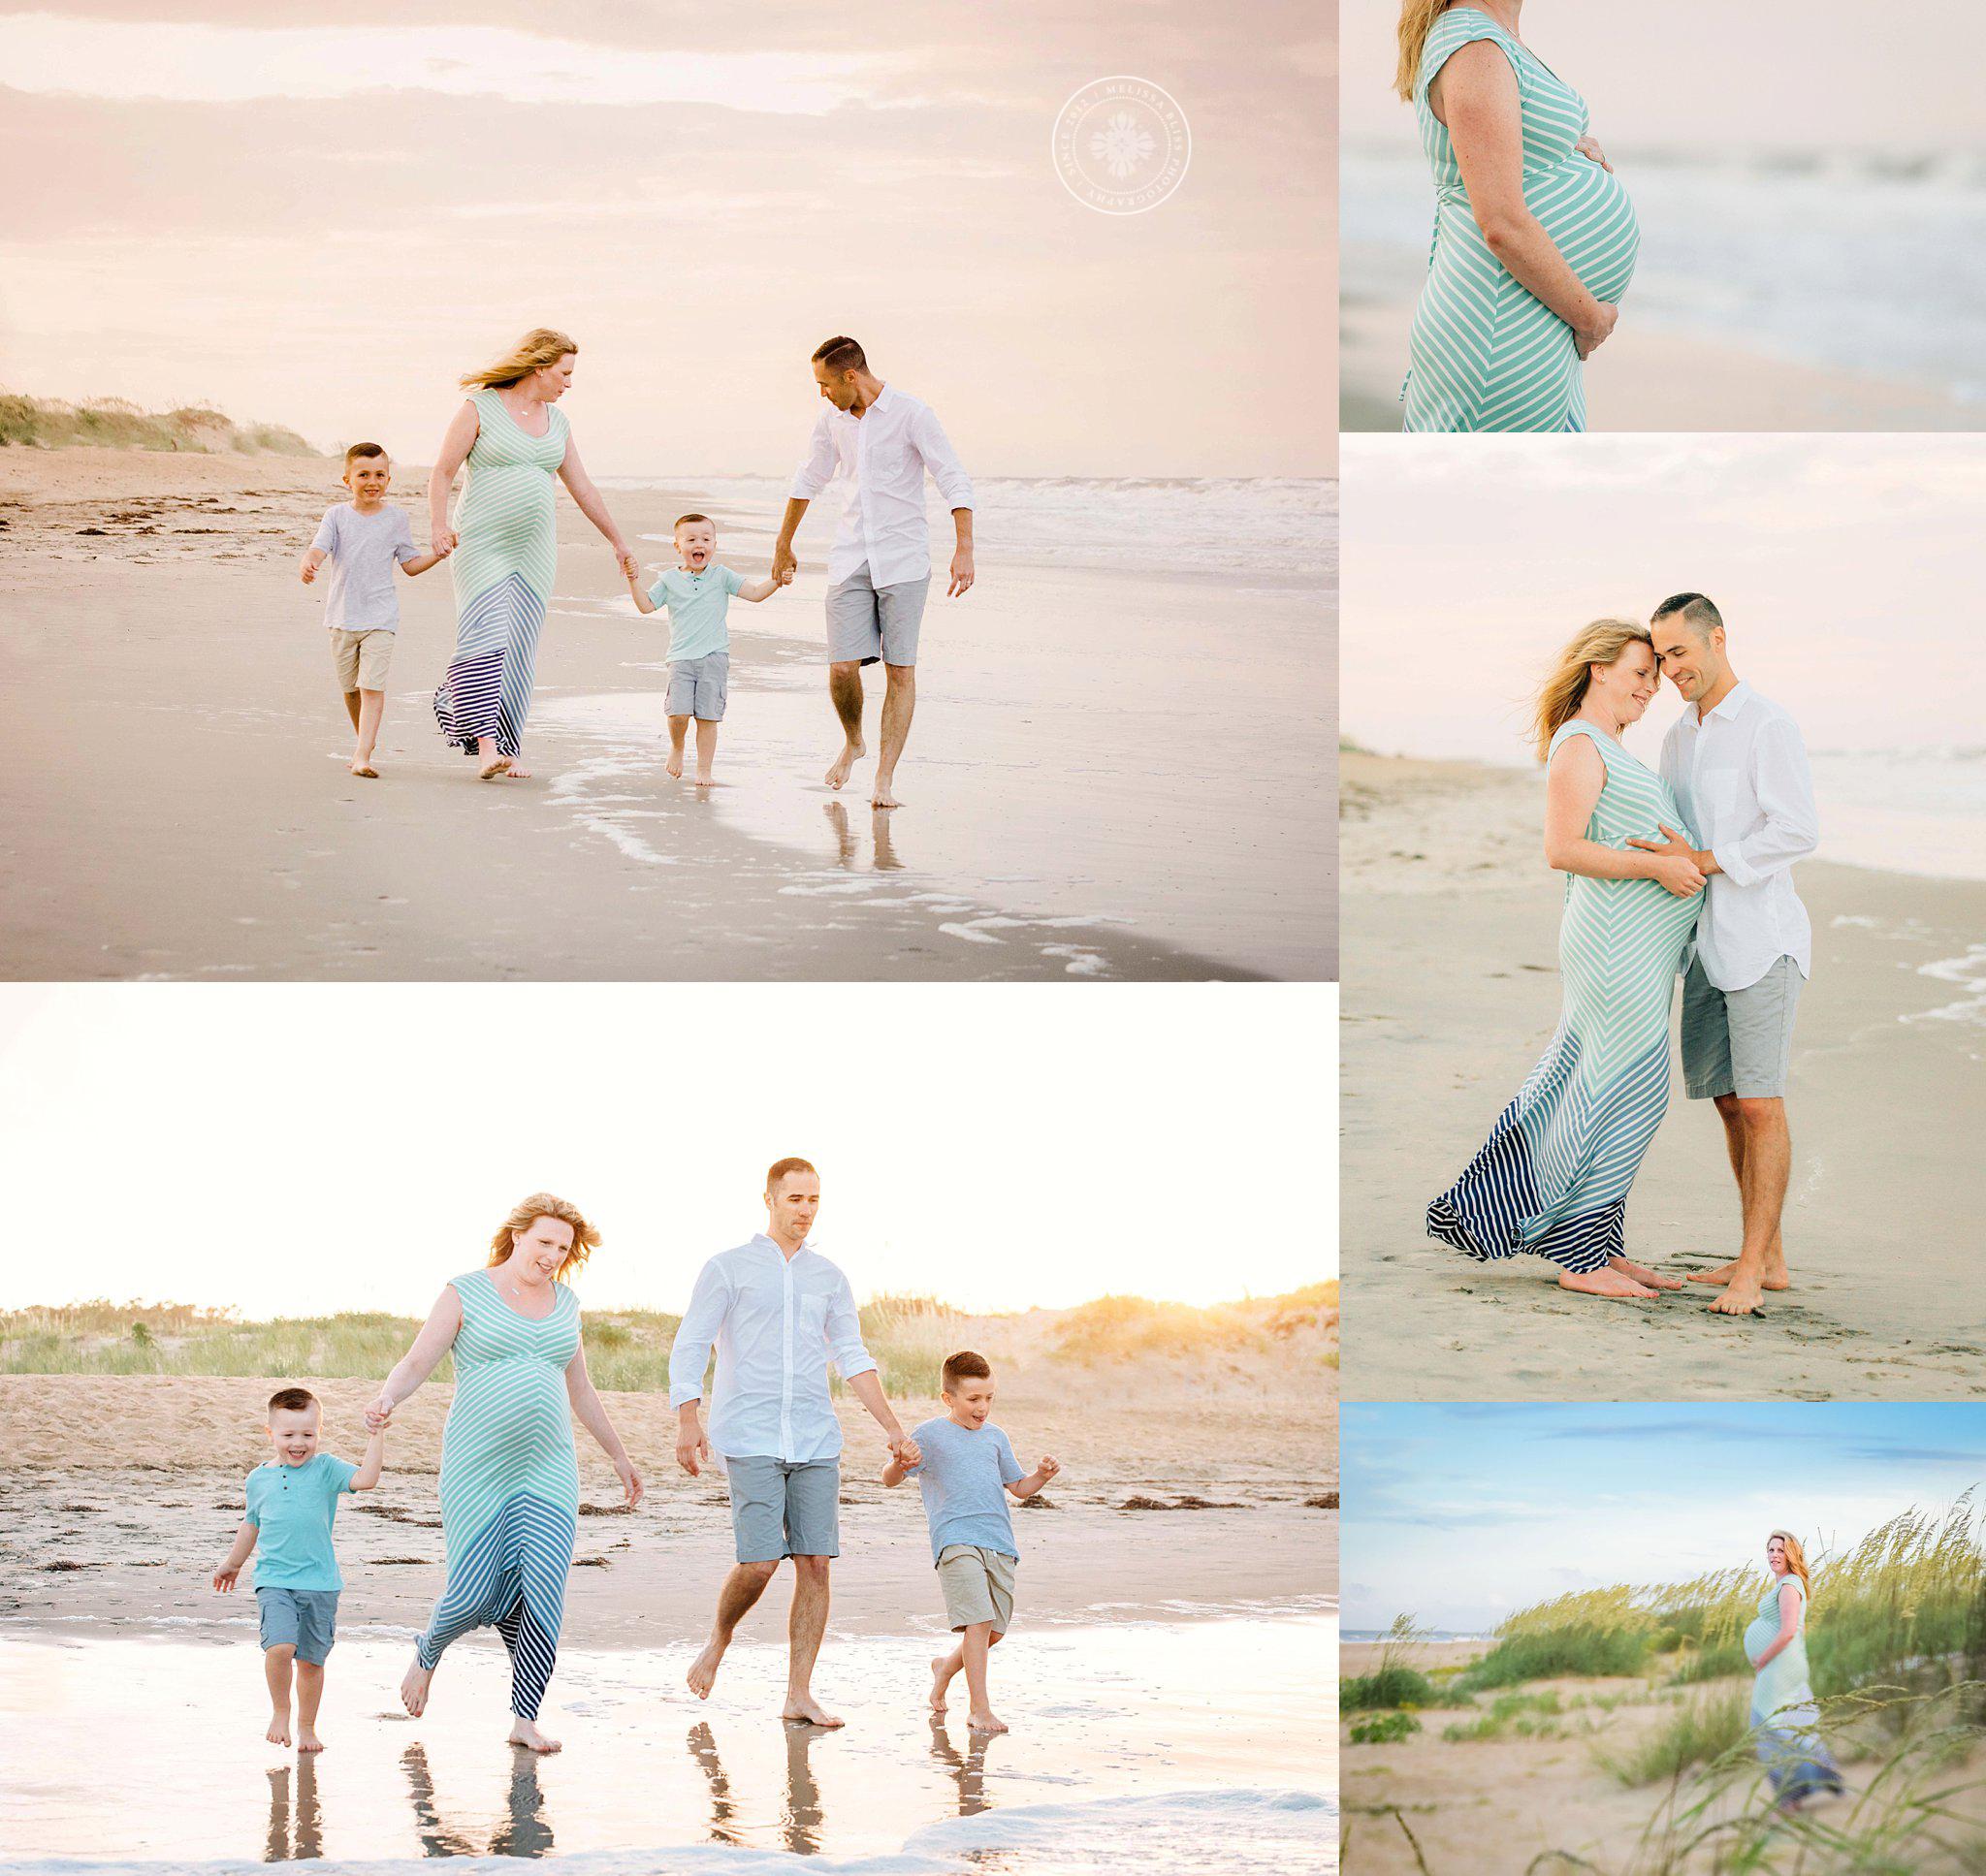 norfolk-photographers-virginia-beach-maternity-portraits-family-lifestyle-photographer-melissa-bliss-photography-hampton-roads-va.jpg